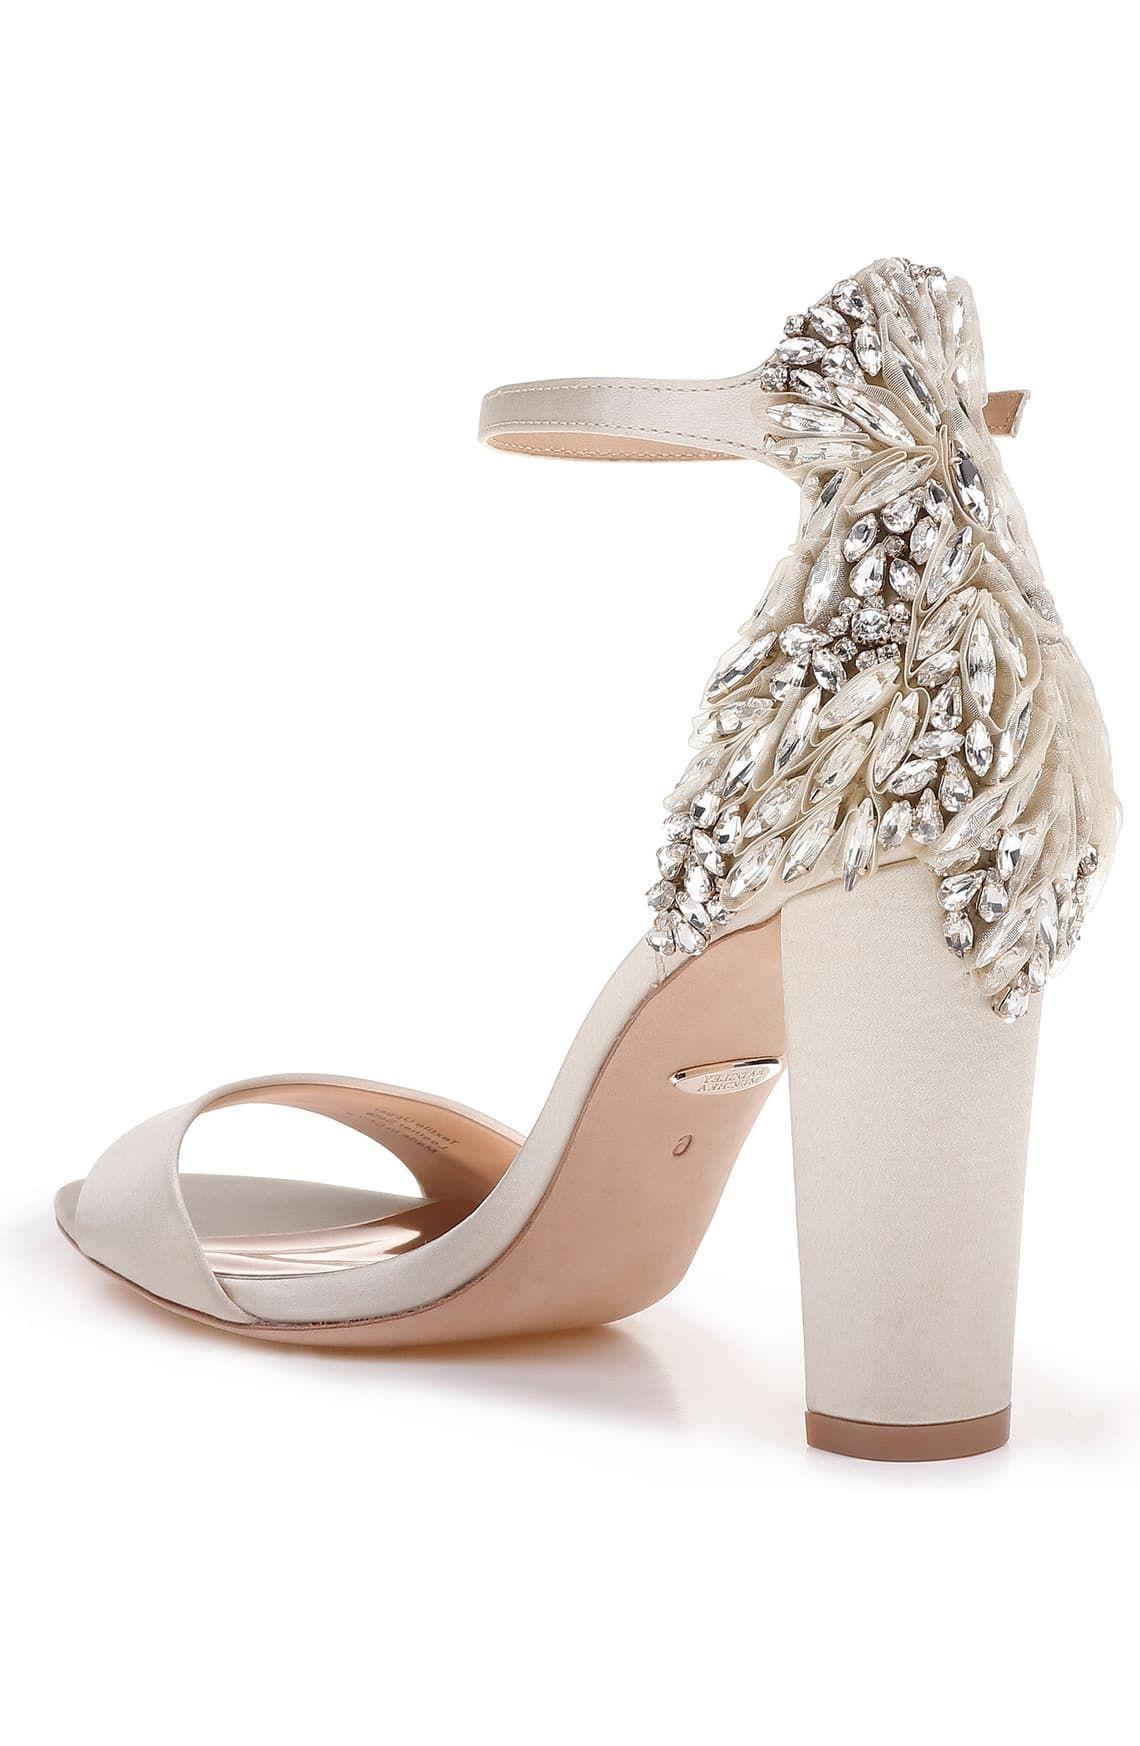 Badgley Mischka Seina Ankle Strap Sandal Women Nordstrom Bridal Shoes Low Heel Bridal Shoes Strap Sandals Women